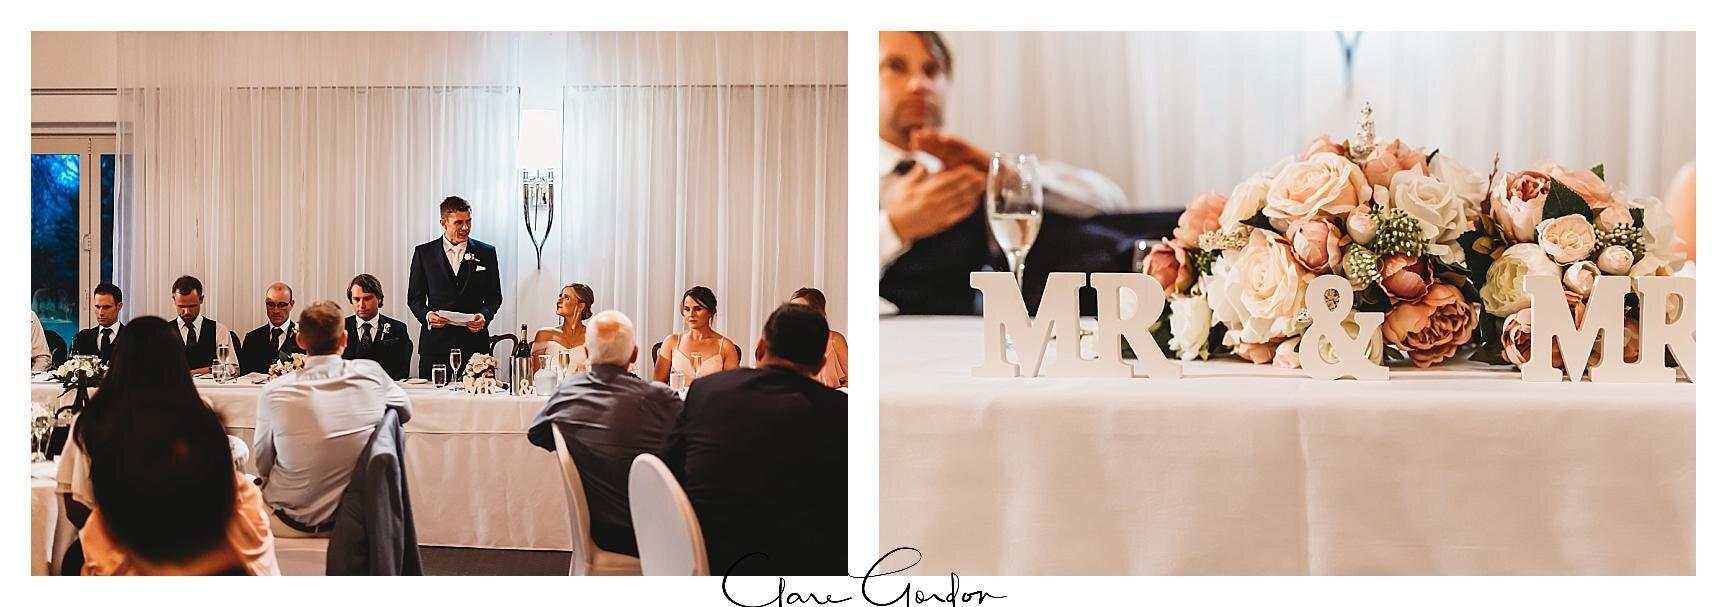 Henley-Hotel-Cherry-blossom-wedding-photos (79).jpg